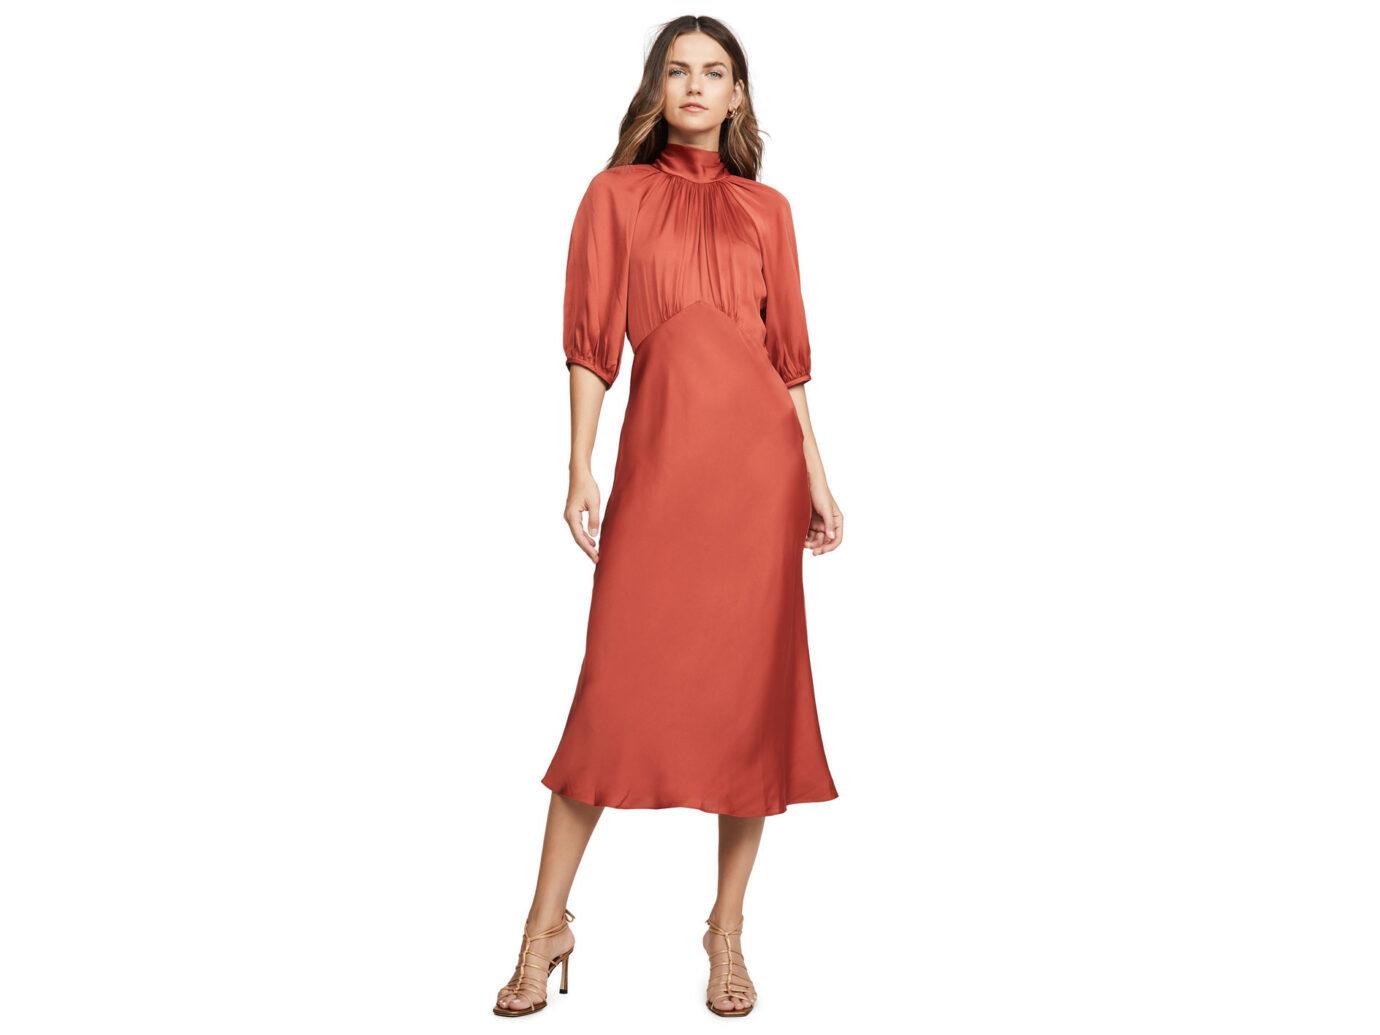 Rebecca Taylor Short Sleeve Satin Tye Dress